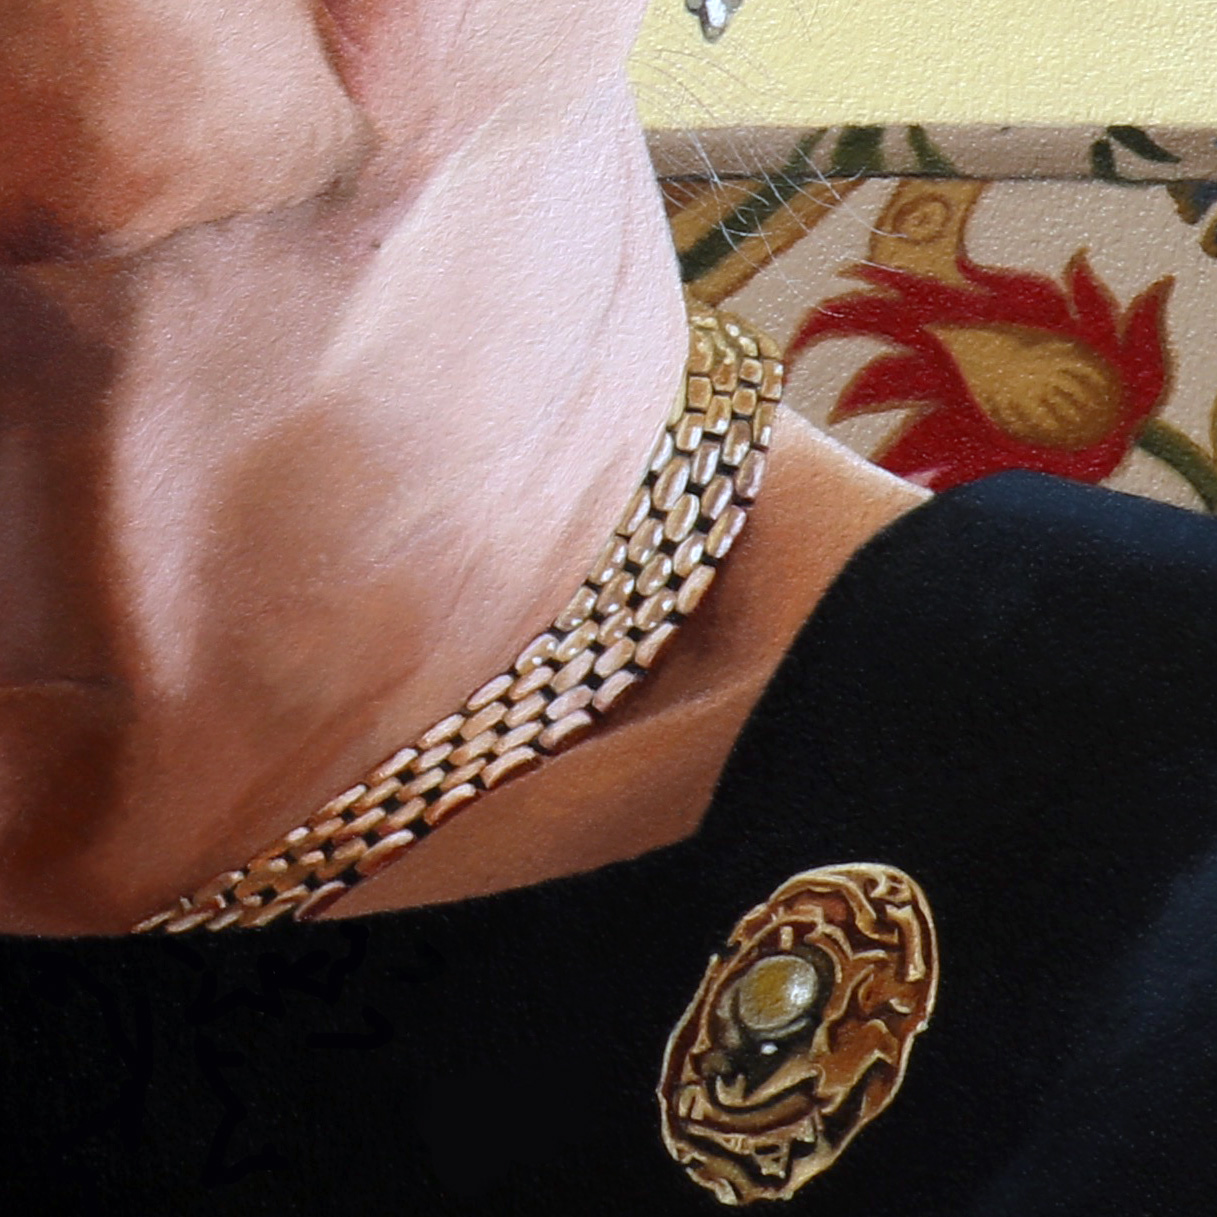 Jewellery detail